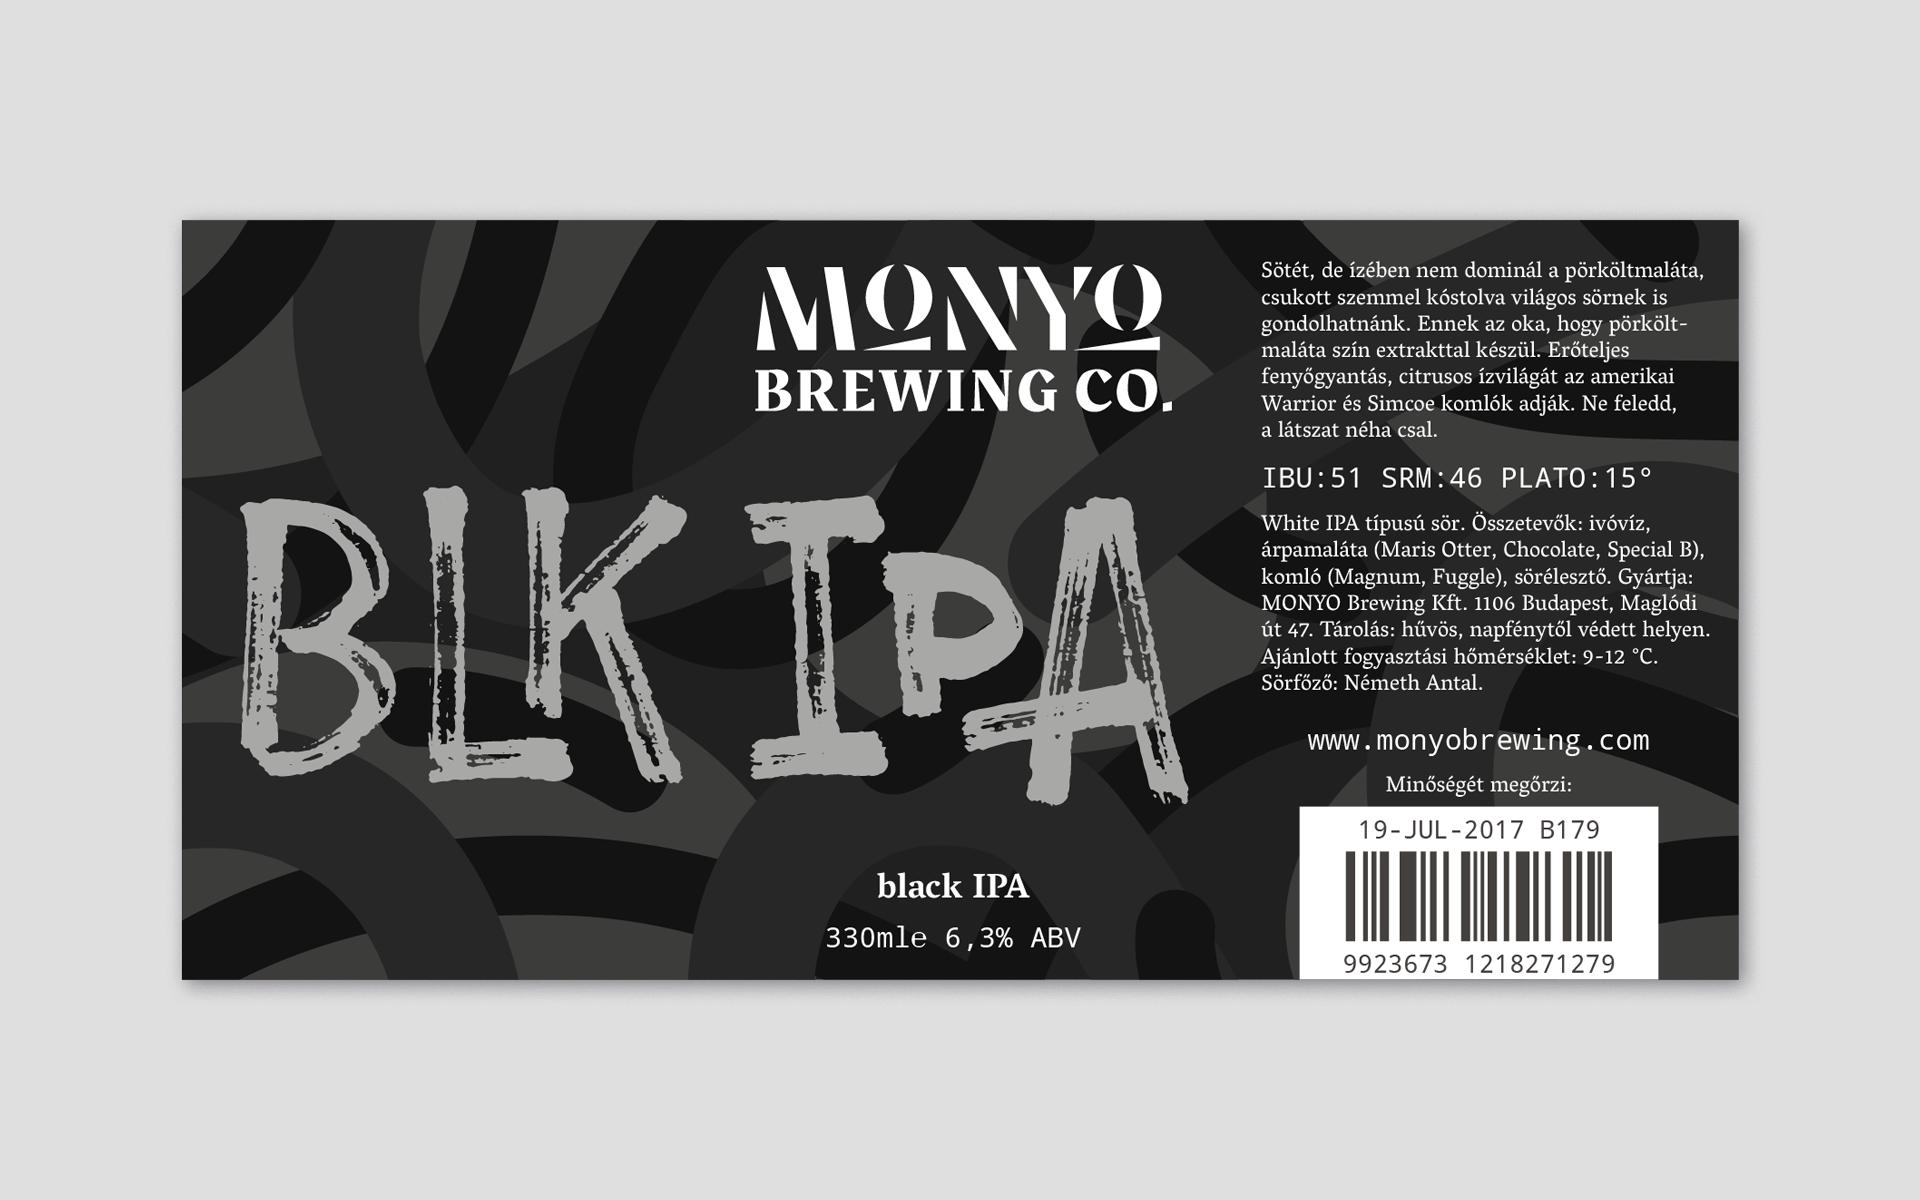 MONYO craft beer packaging \ Black IPA label design